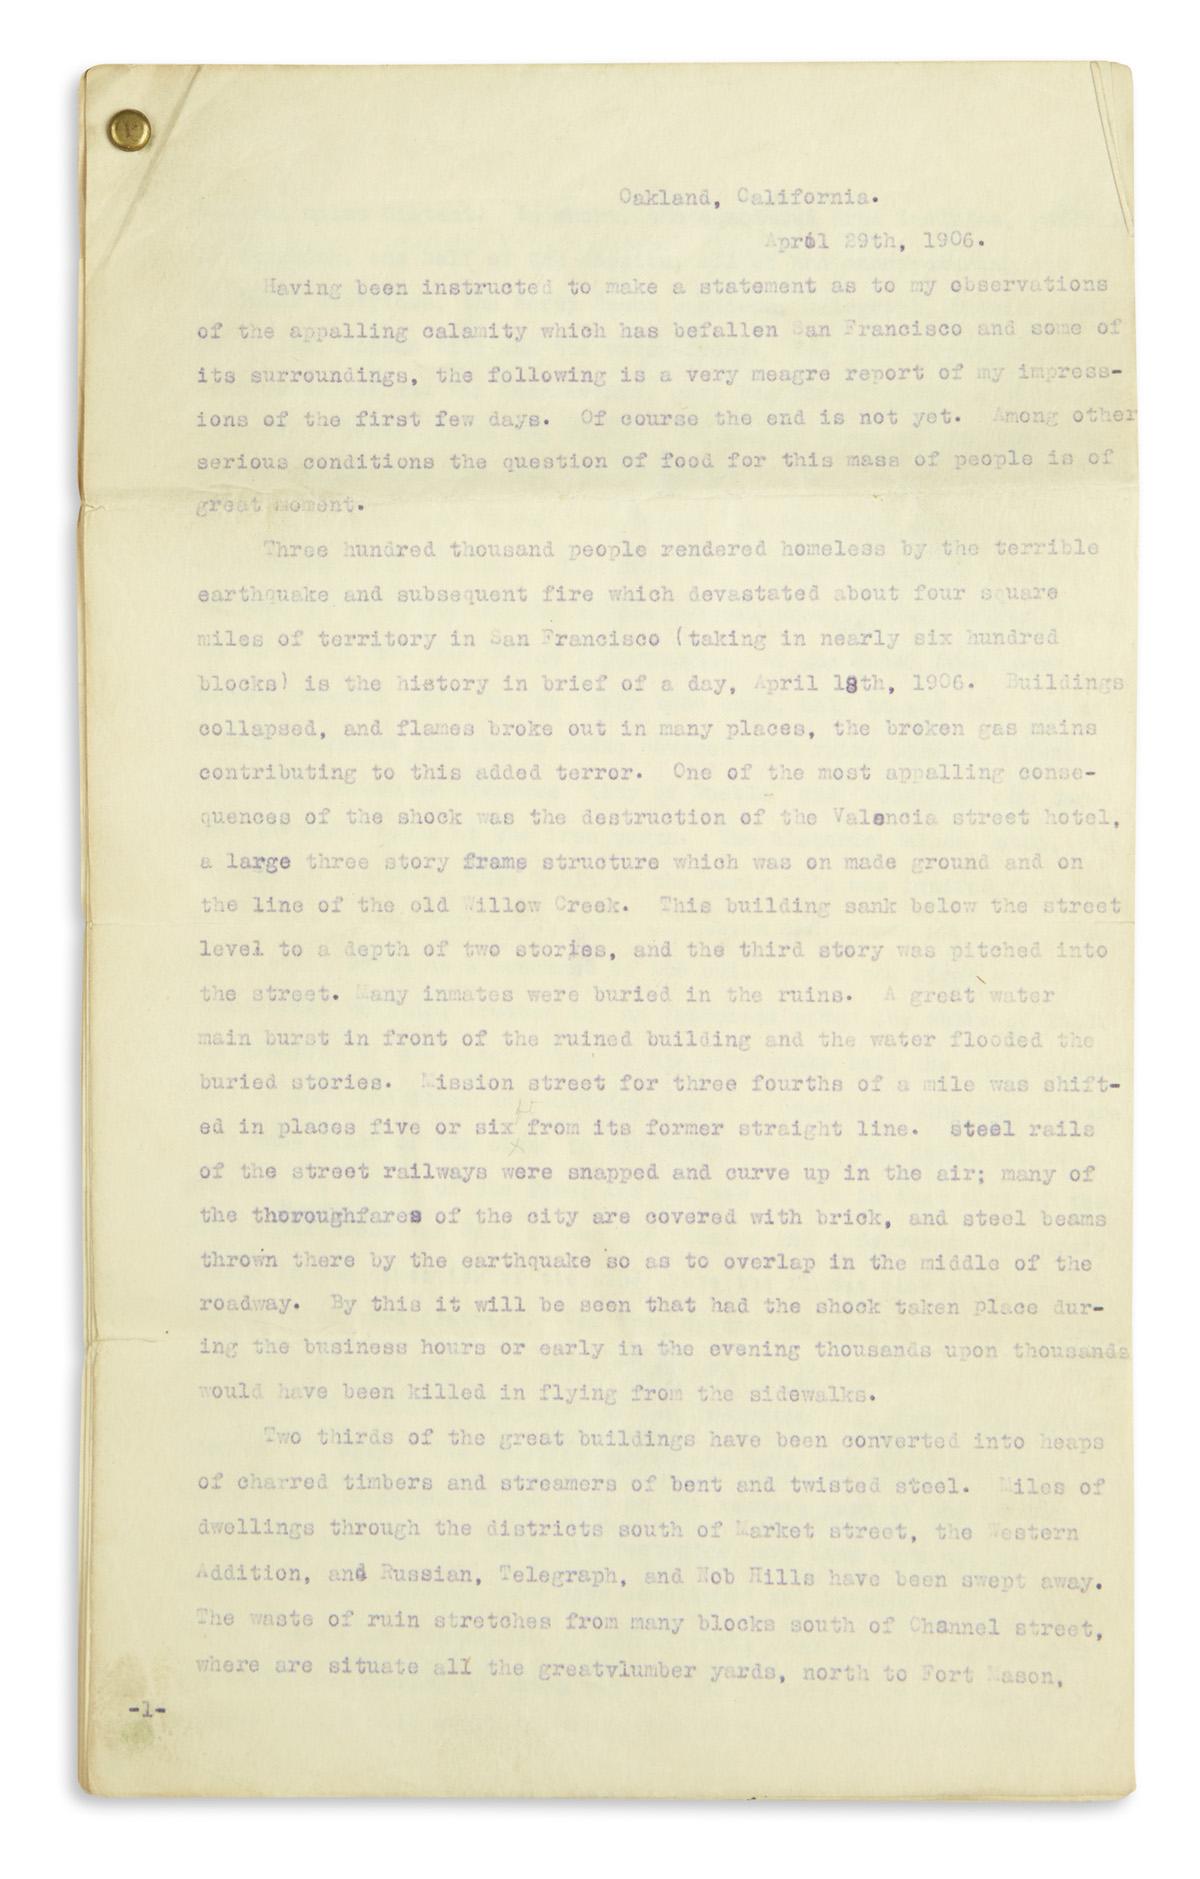 (CALIFORNIA.) Wilhelm, Thomas. Detailed report on the 1906 San Francisco Earthquake.